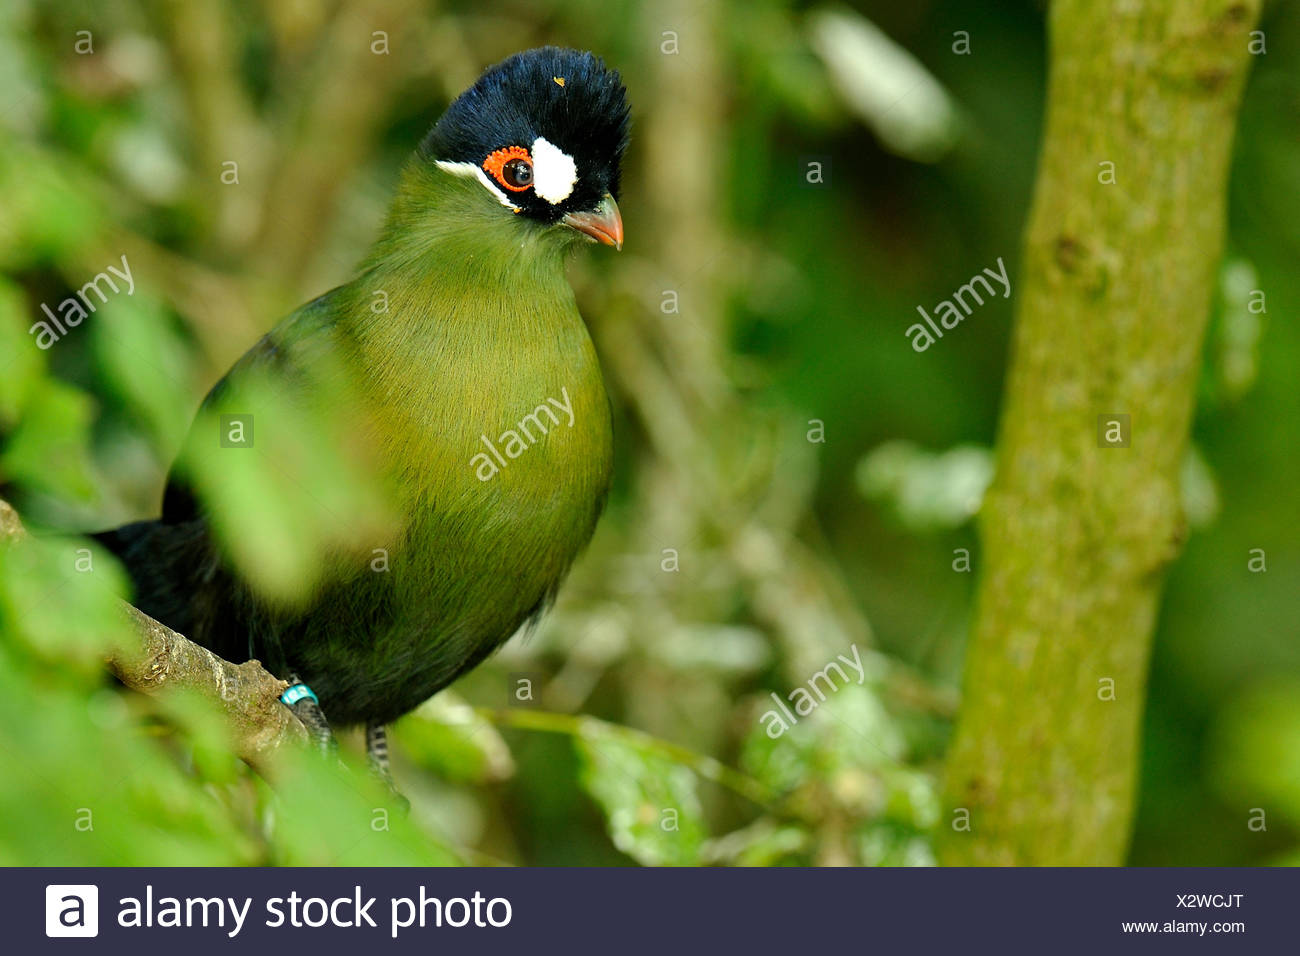 hartlaubs turaco animal bird stock photos hartlaubs. Black Bedroom Furniture Sets. Home Design Ideas